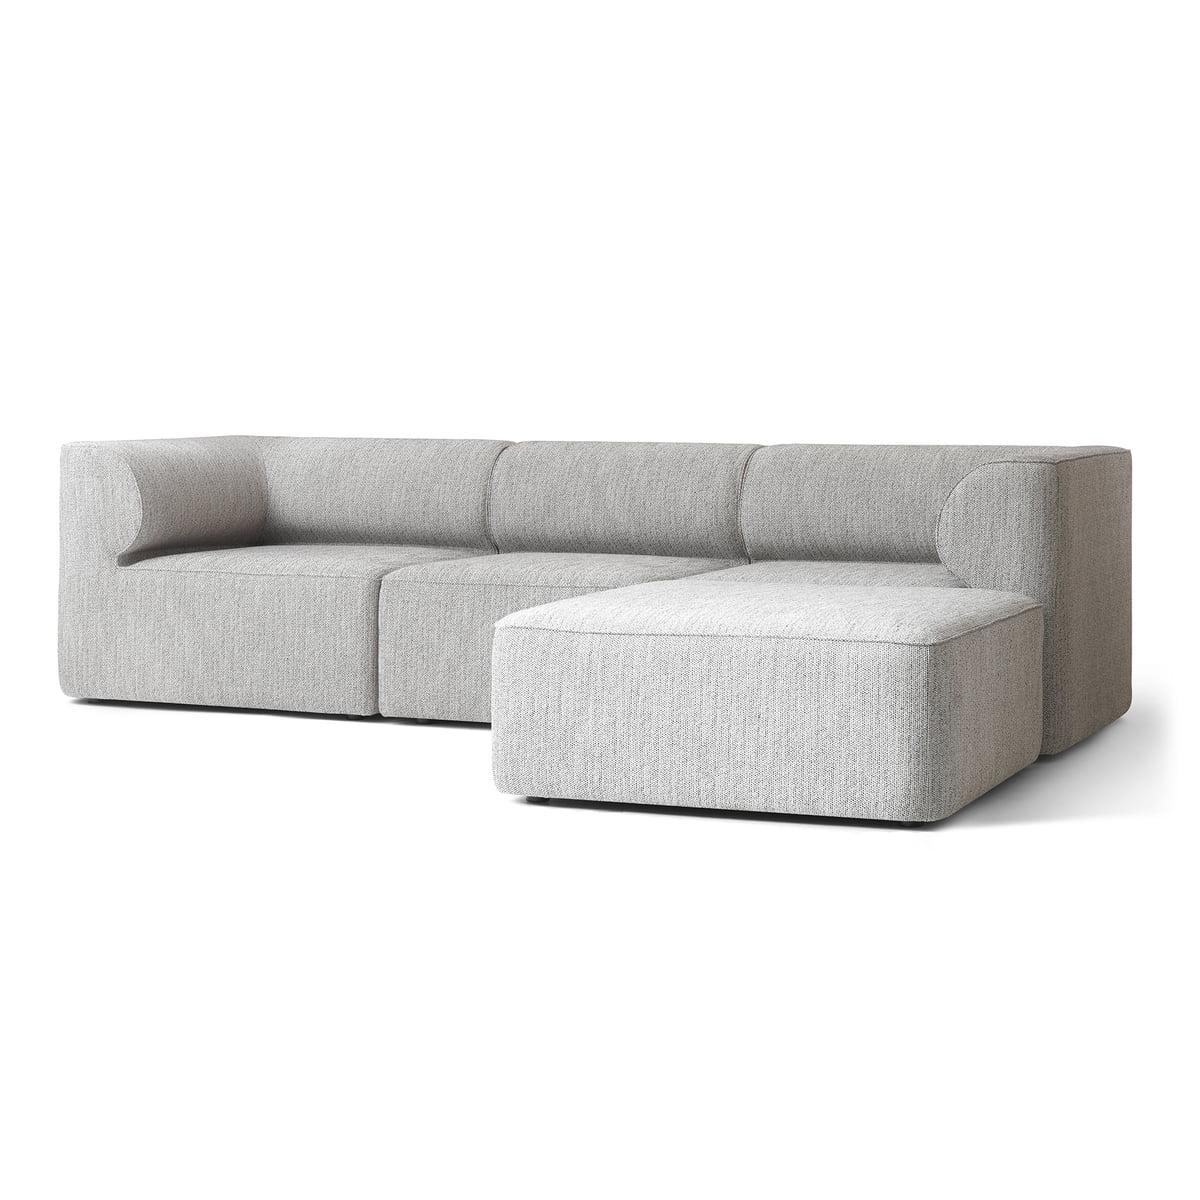 the menu - Eaves modular sofa in light gray LHFASEI